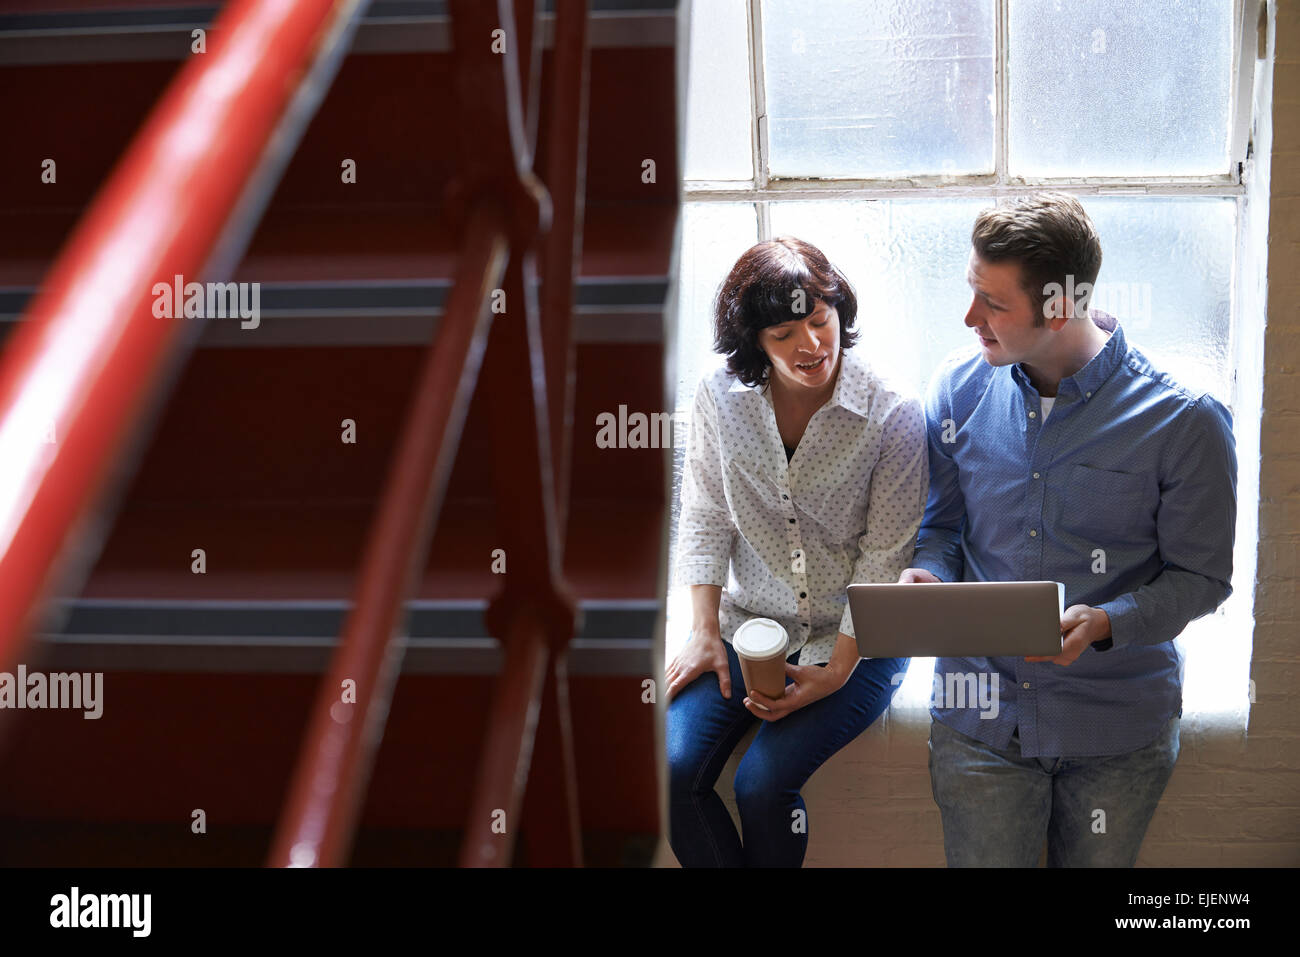 Dos empresarios tener Reunión Informal sobre Office escaleras Imagen De Stock